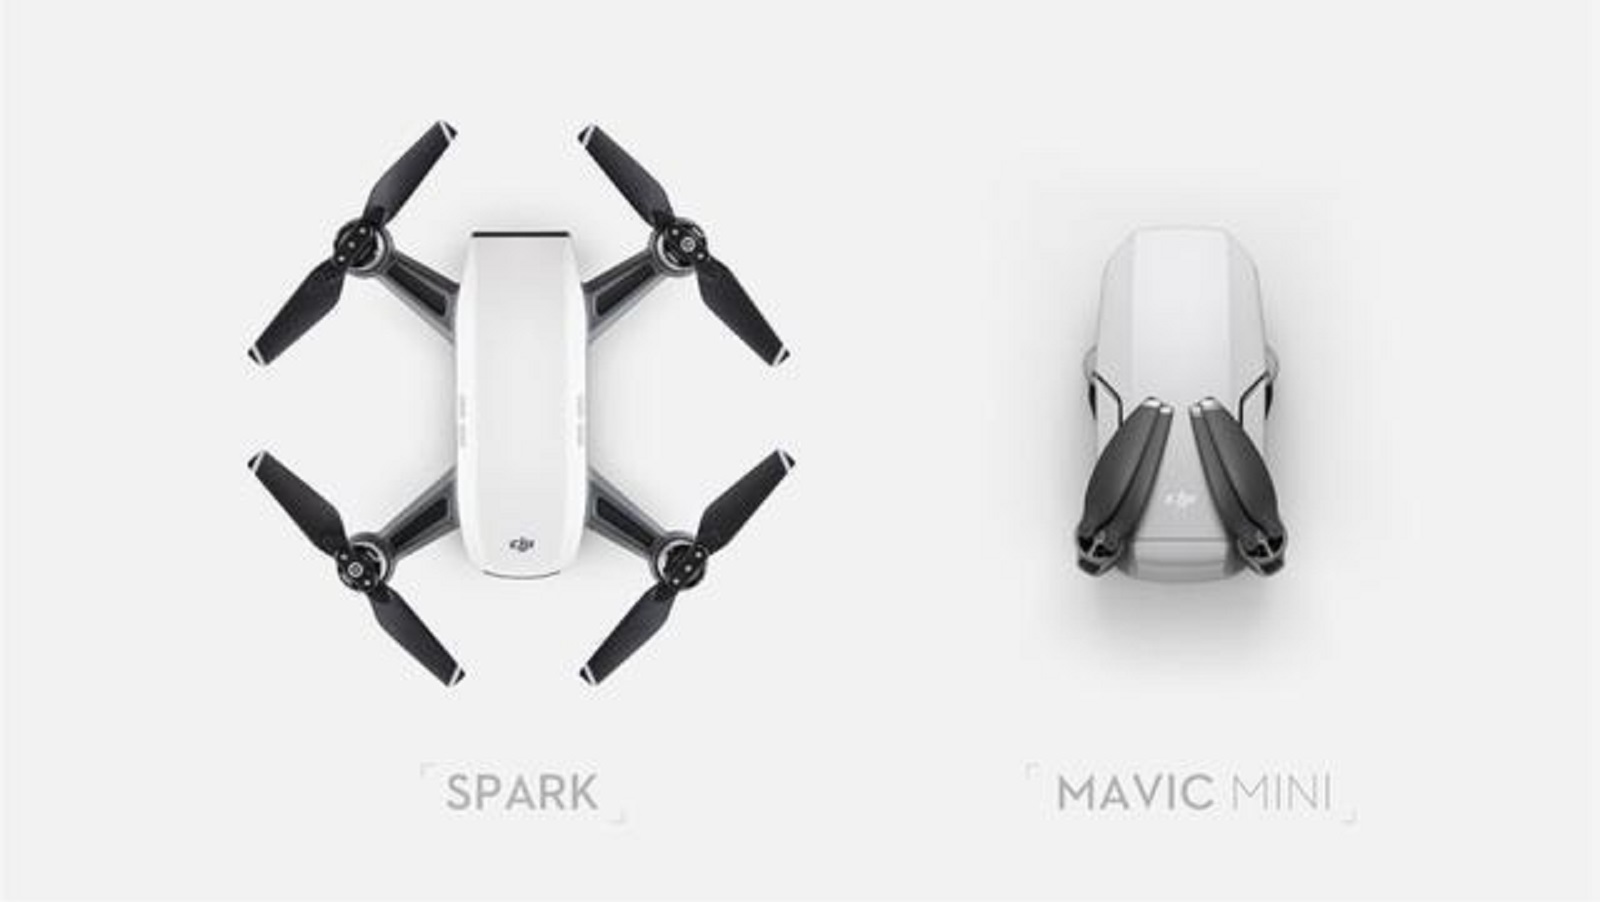 Mavic Mini vs Spark: что выбрать?